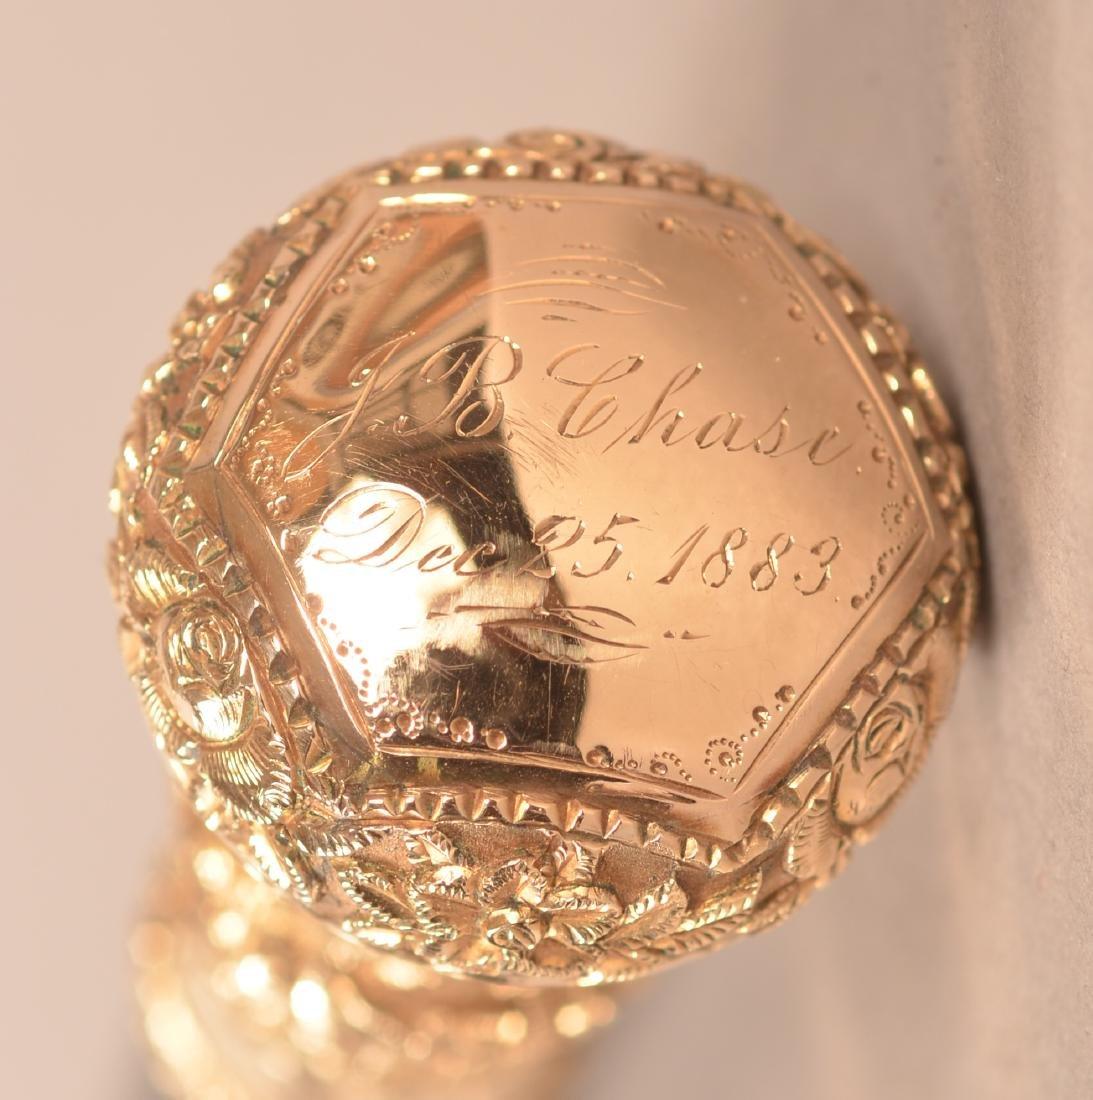 J.B Chase 1883 Victorian Presentation Cane - 2